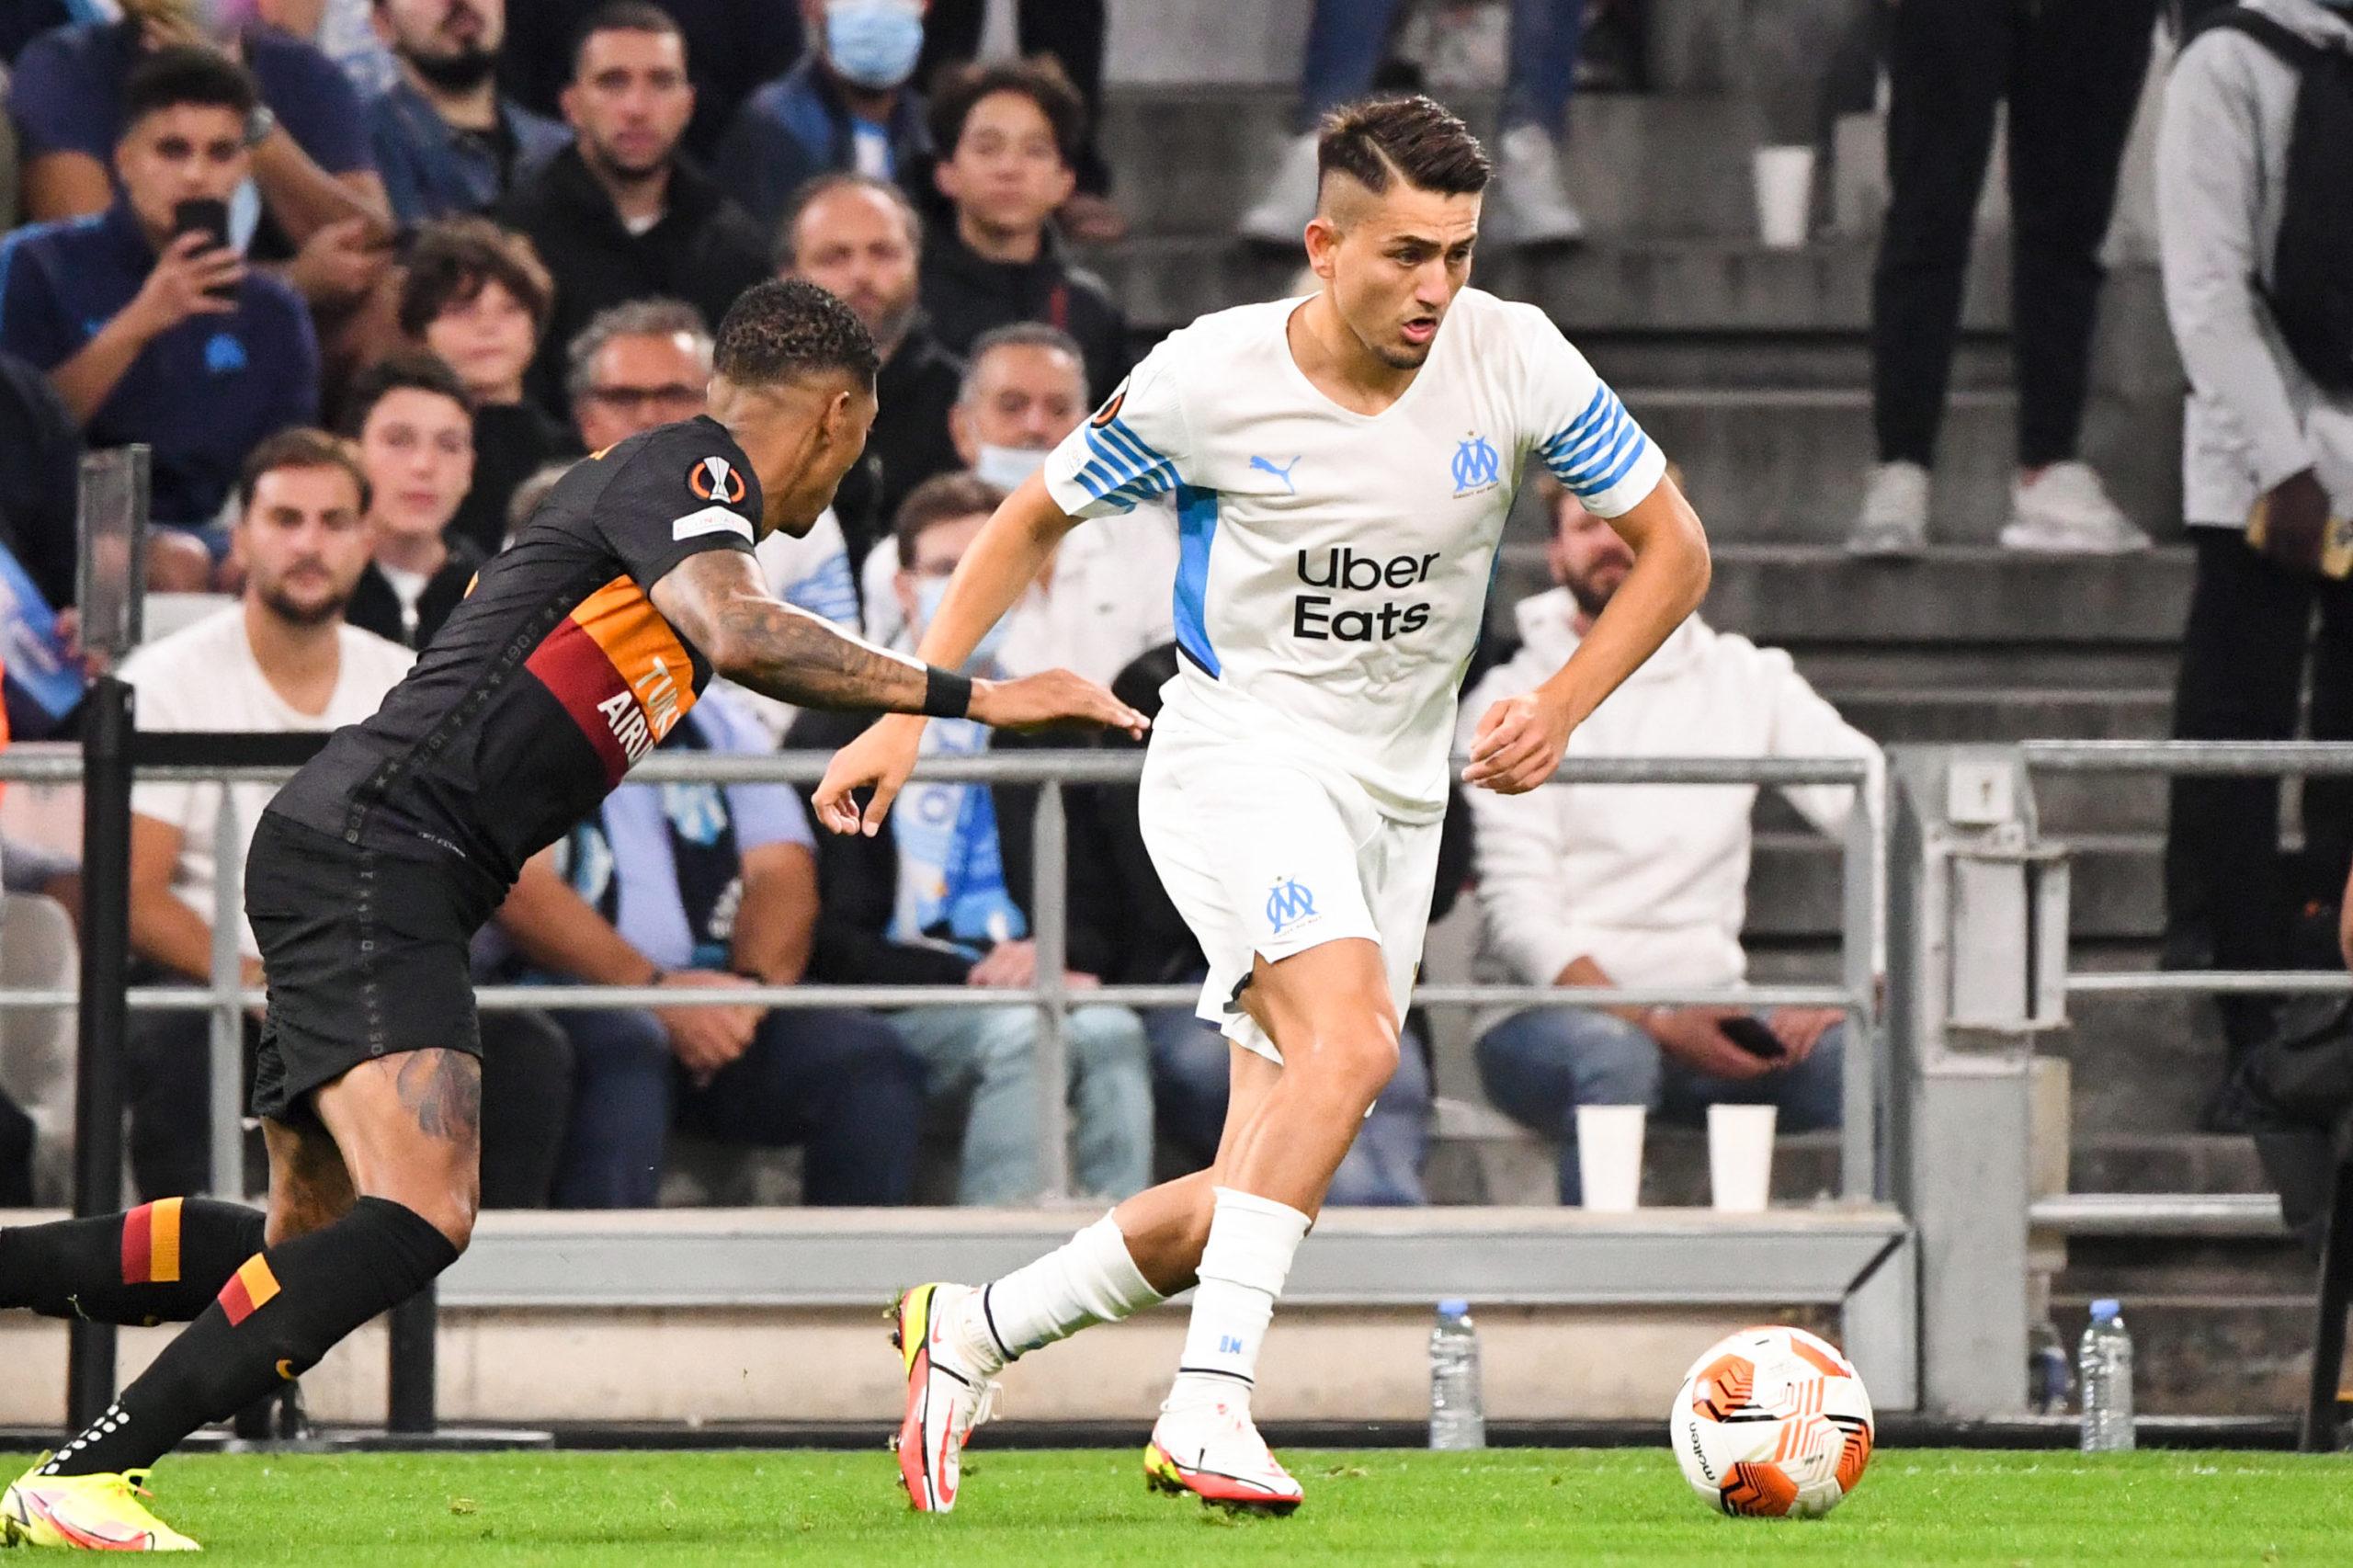 Mercato OM : Cengiz Under aurait pu aller ailleurs avant Marseille